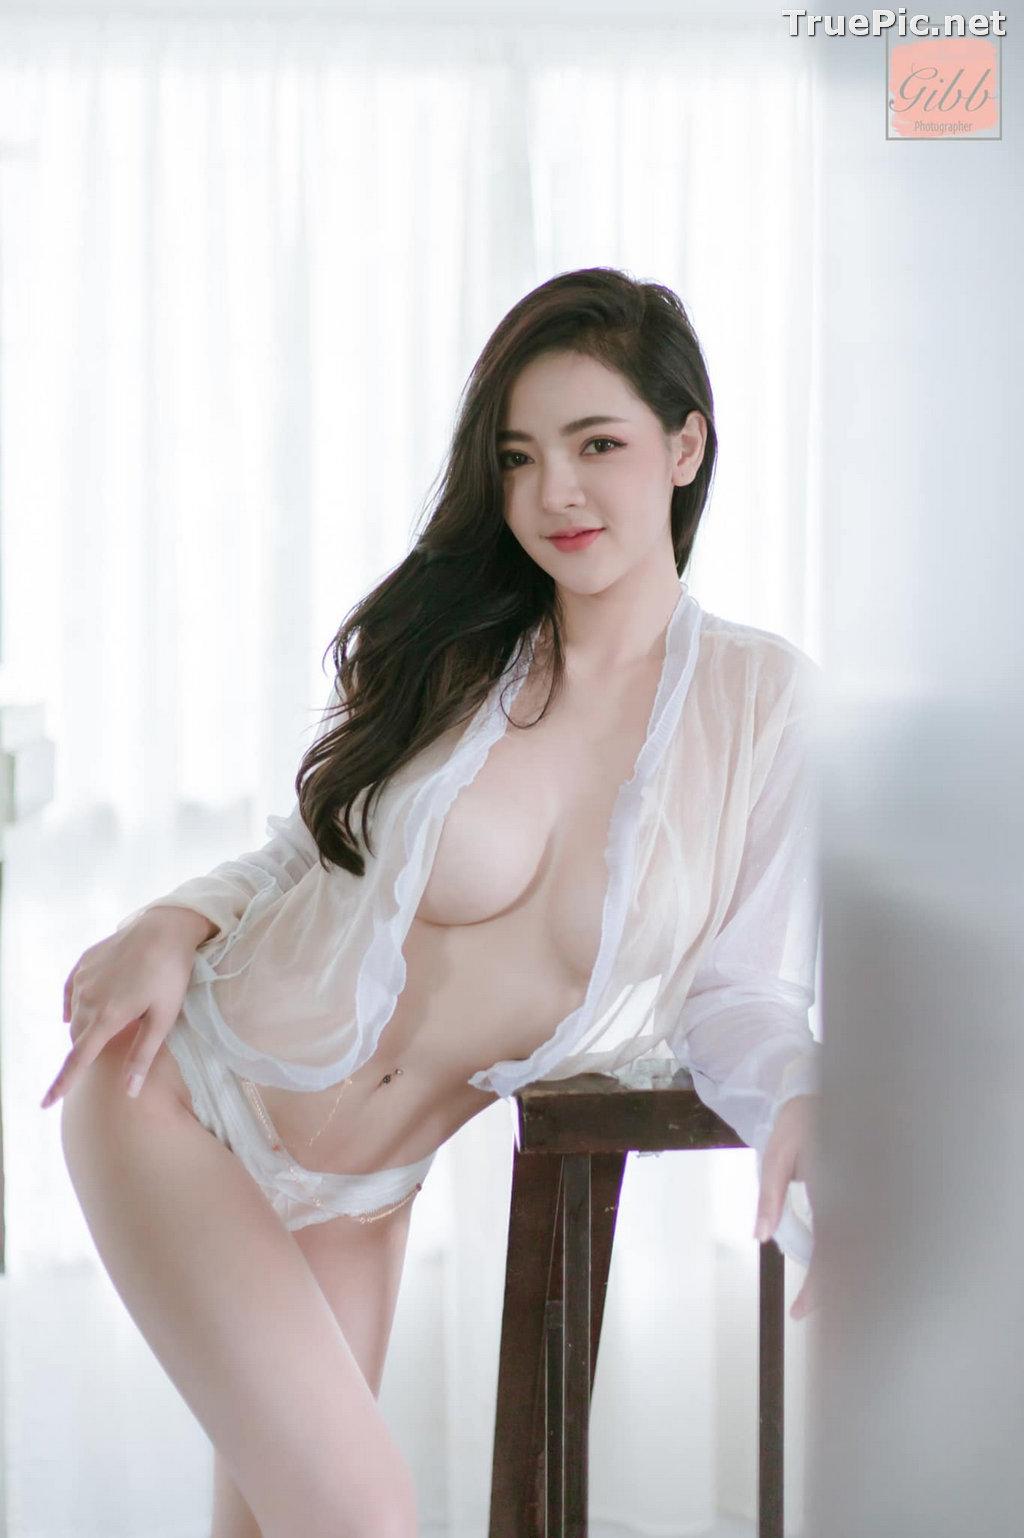 Image Thailand Sexy Model - Montakan Kaengraeng - Hot Meow Meow Kitten - TruePic.net - Picture-1